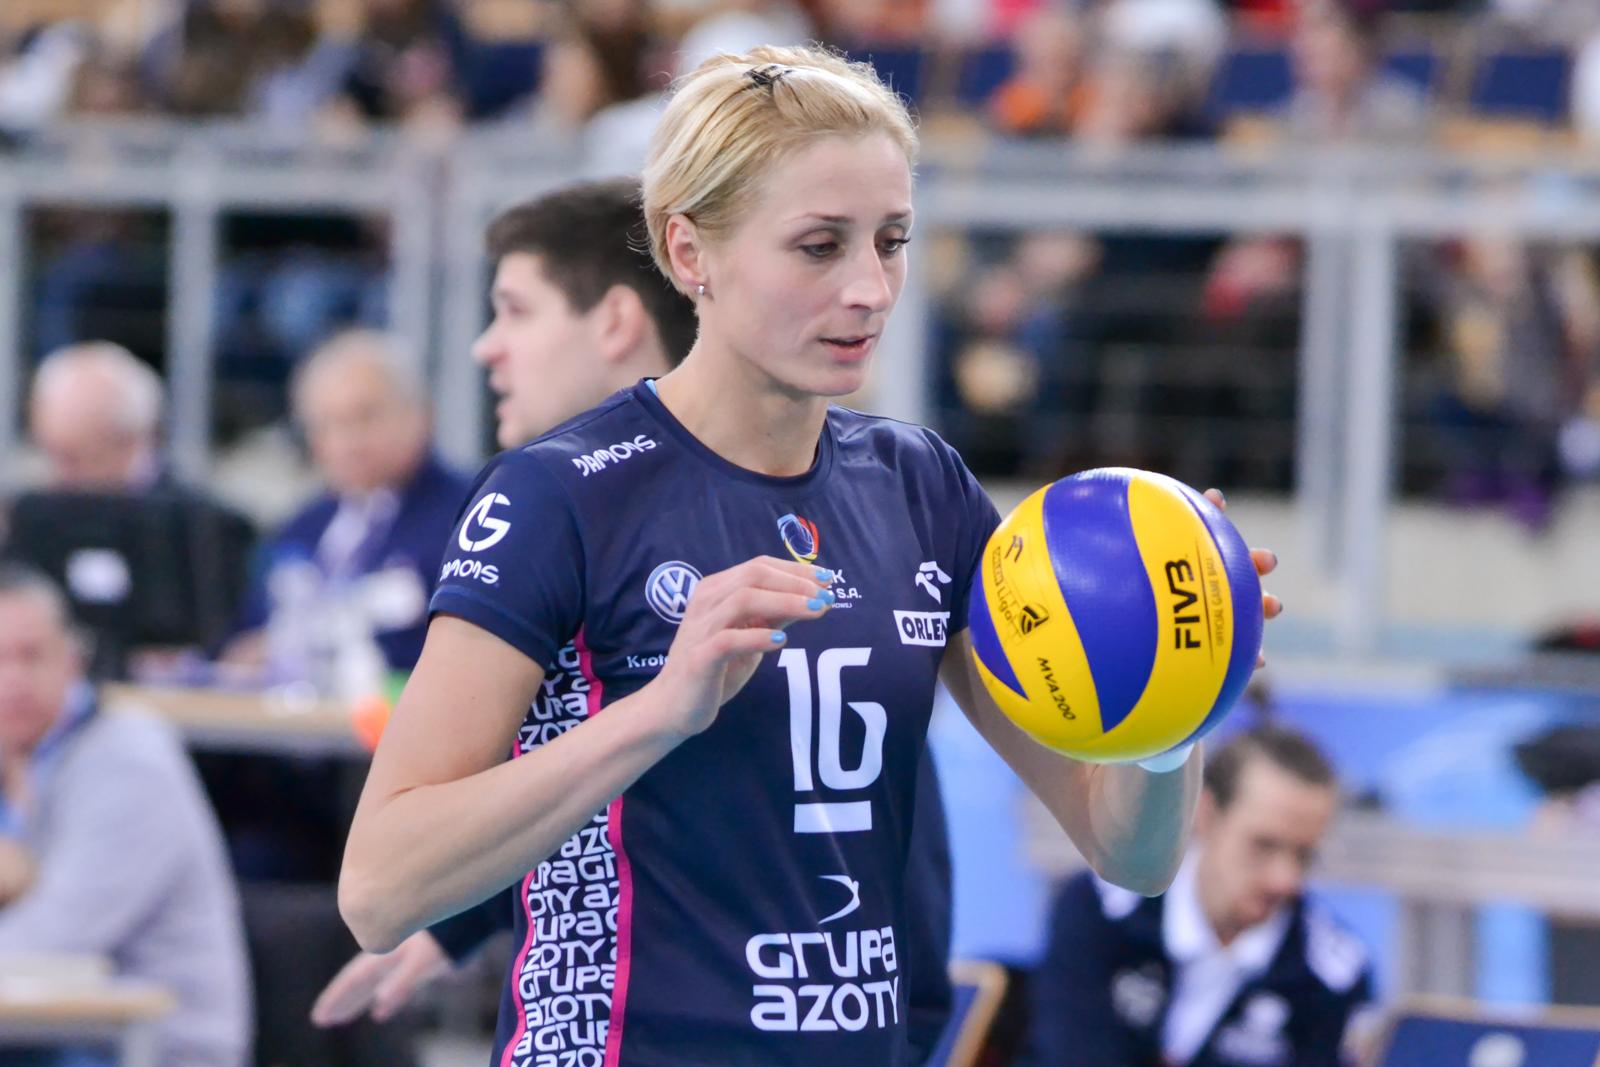 41 - Aleksandra Jagieło